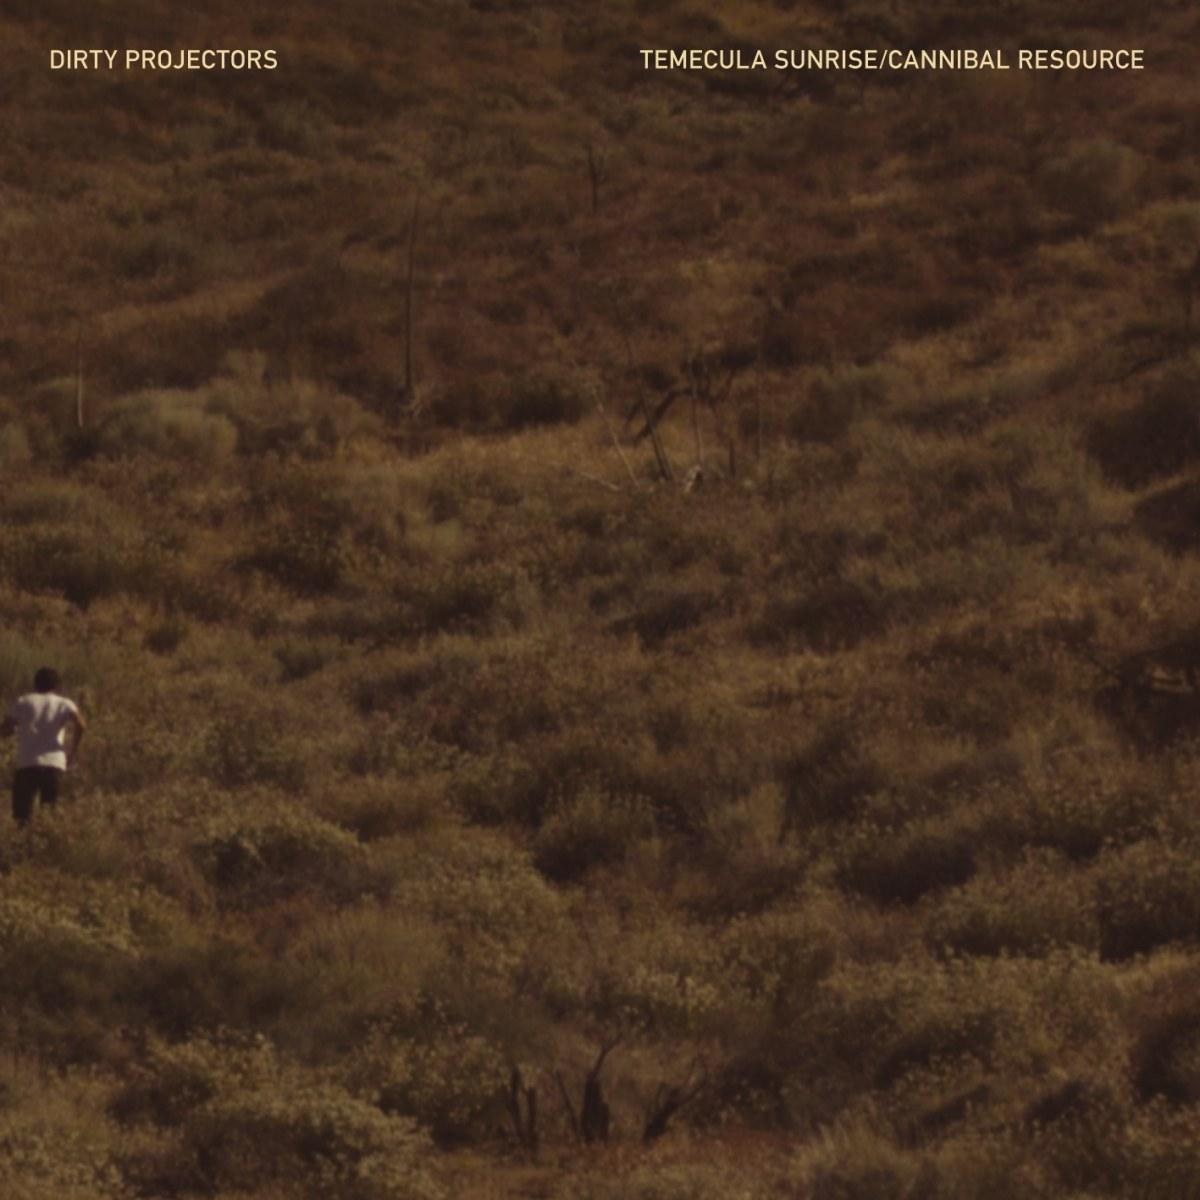 Dirty Projectors - Temecula Sunrise / Cannibal Resource (12